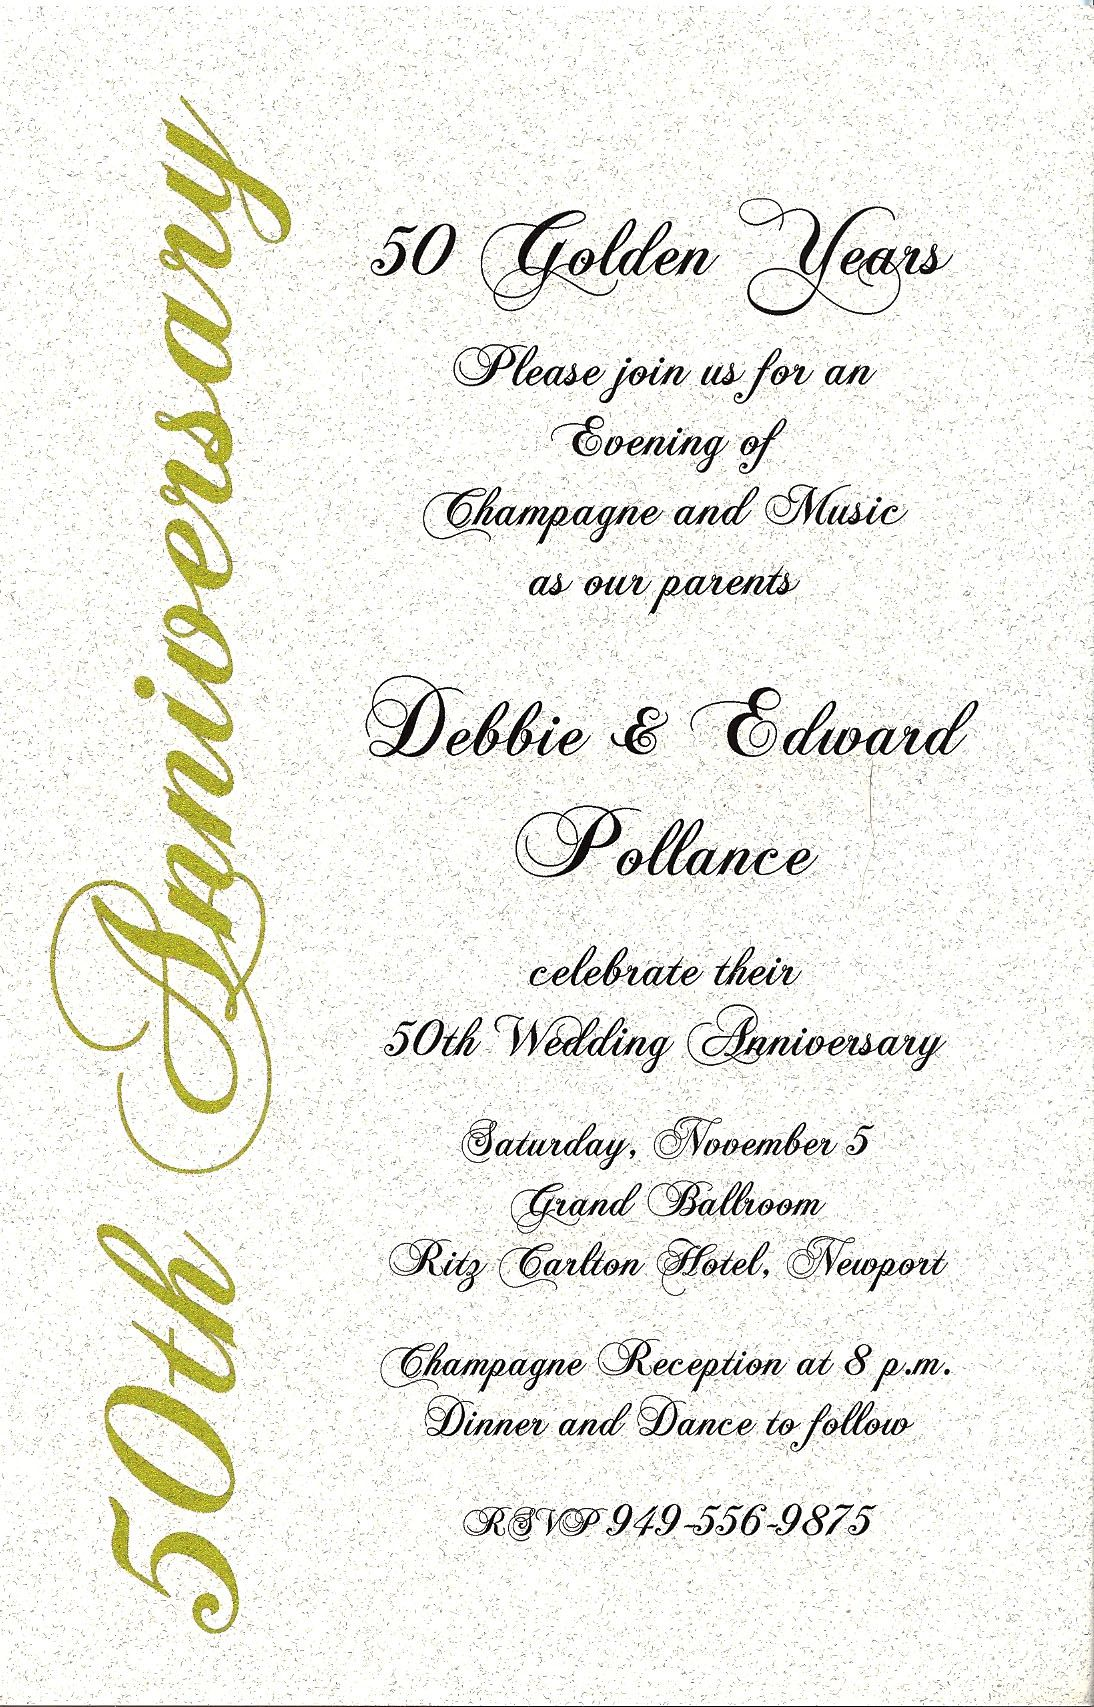 50 Anniversary Invitations 50th Anniversary Previous In Anniversary Invitations Next In 50th Anniversary Invitations 50th Wedding Anniversary 50th Wedding